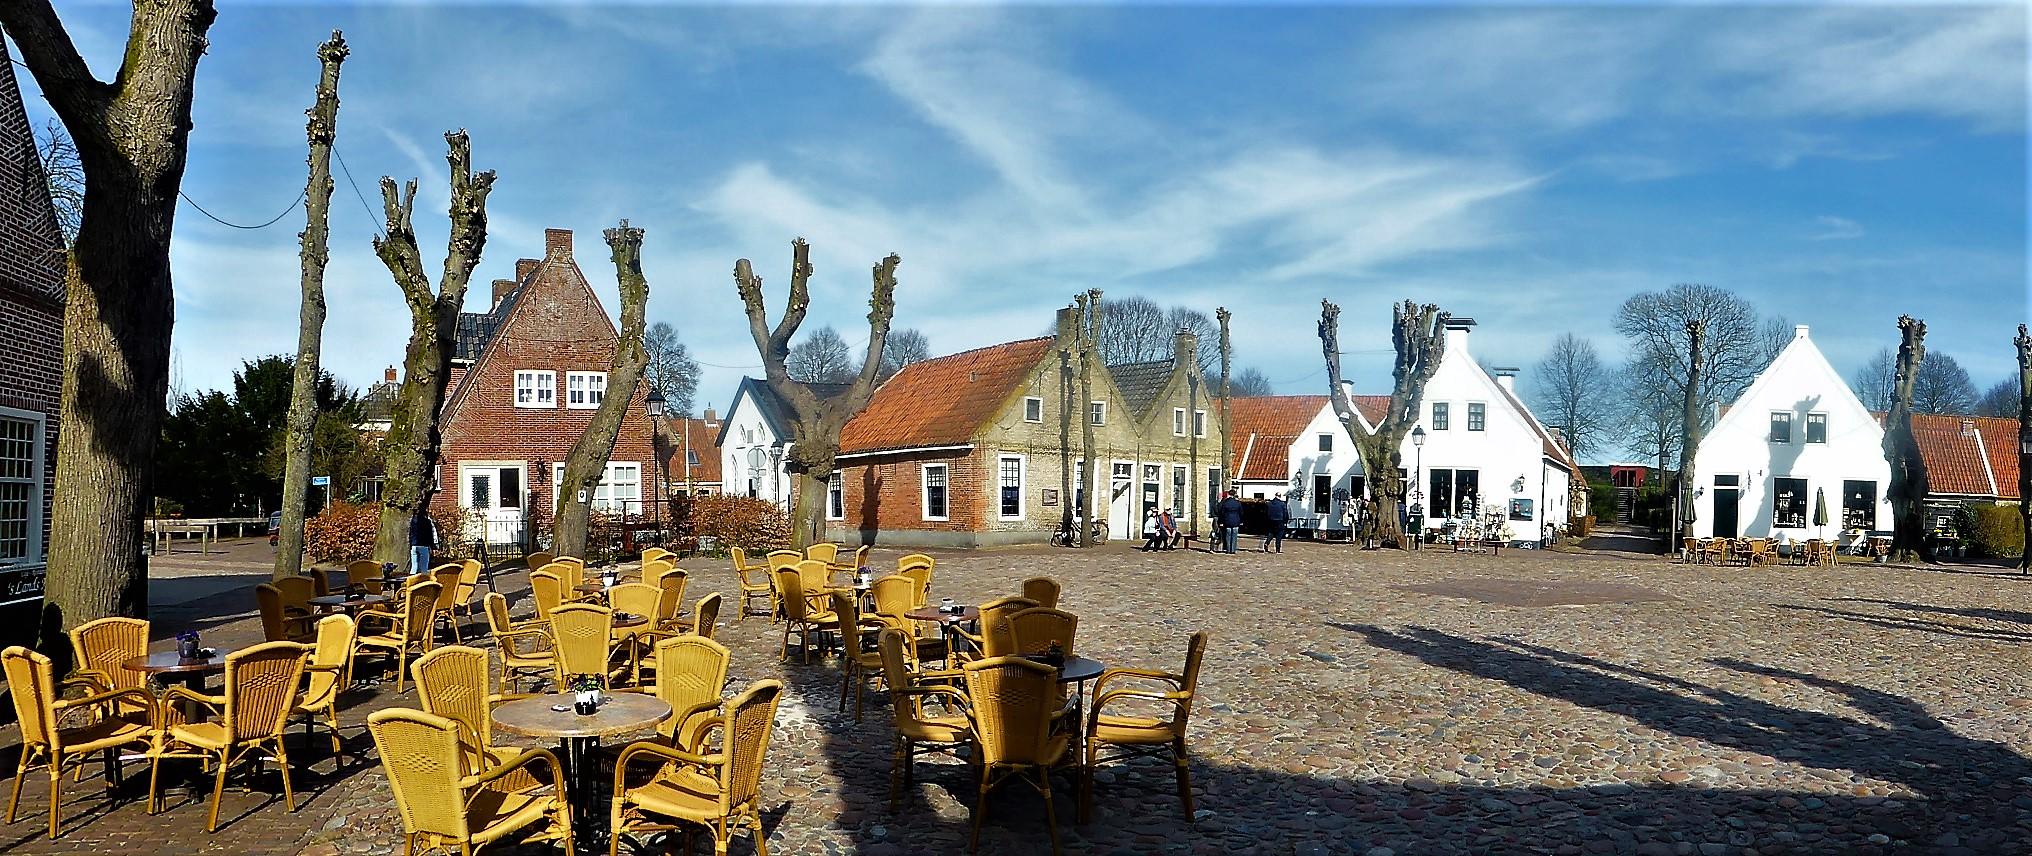 Bourtange in Holland